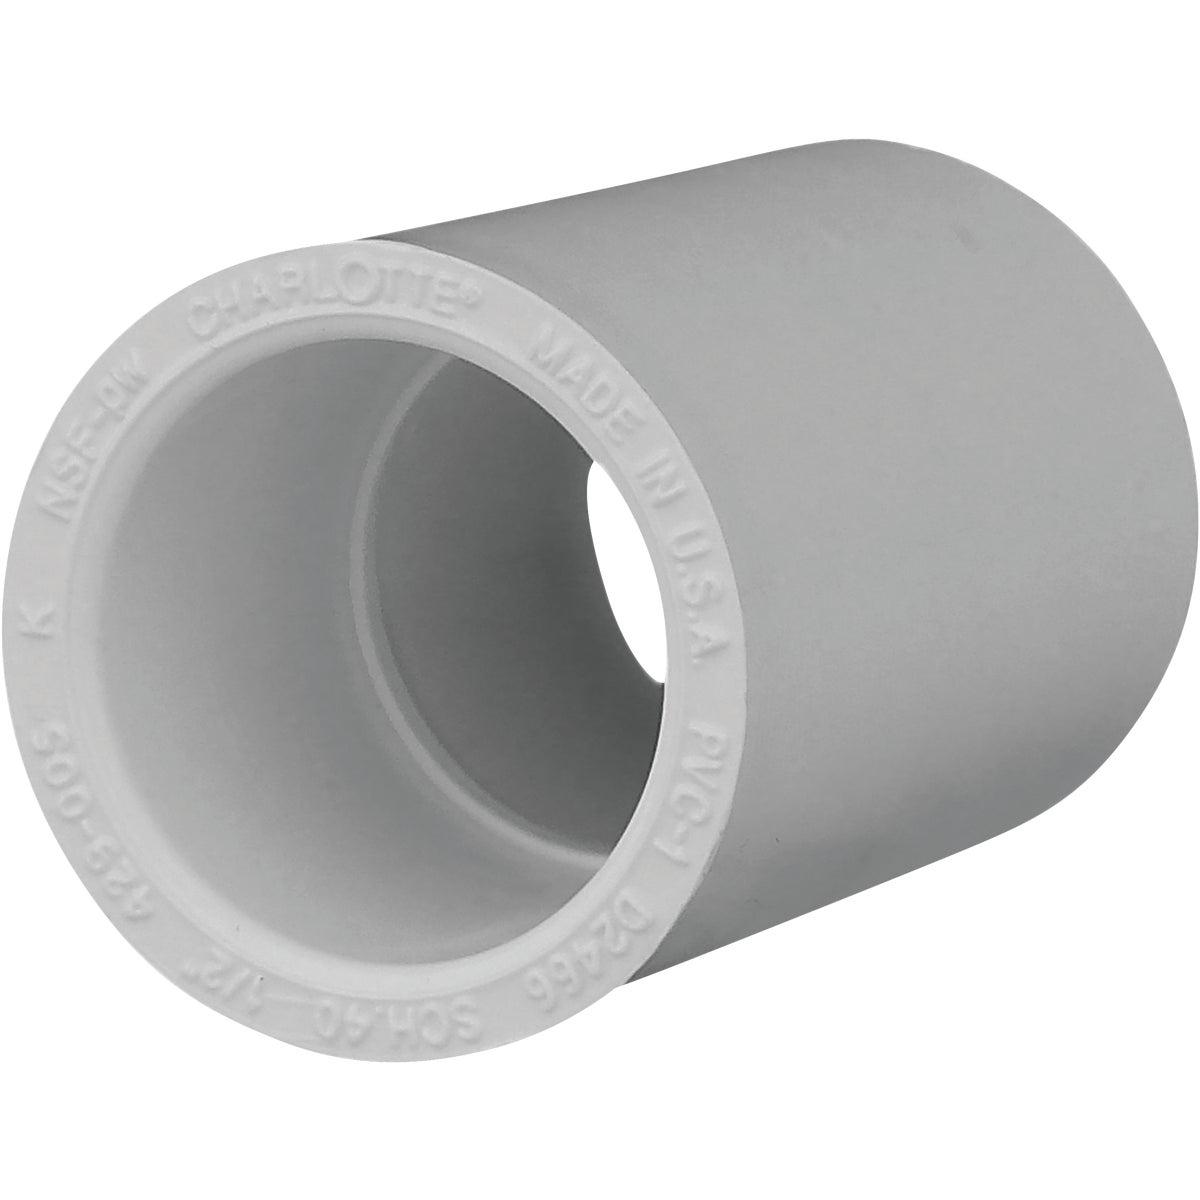 "10PK 1/2"" SCH40 PVC CPLG"